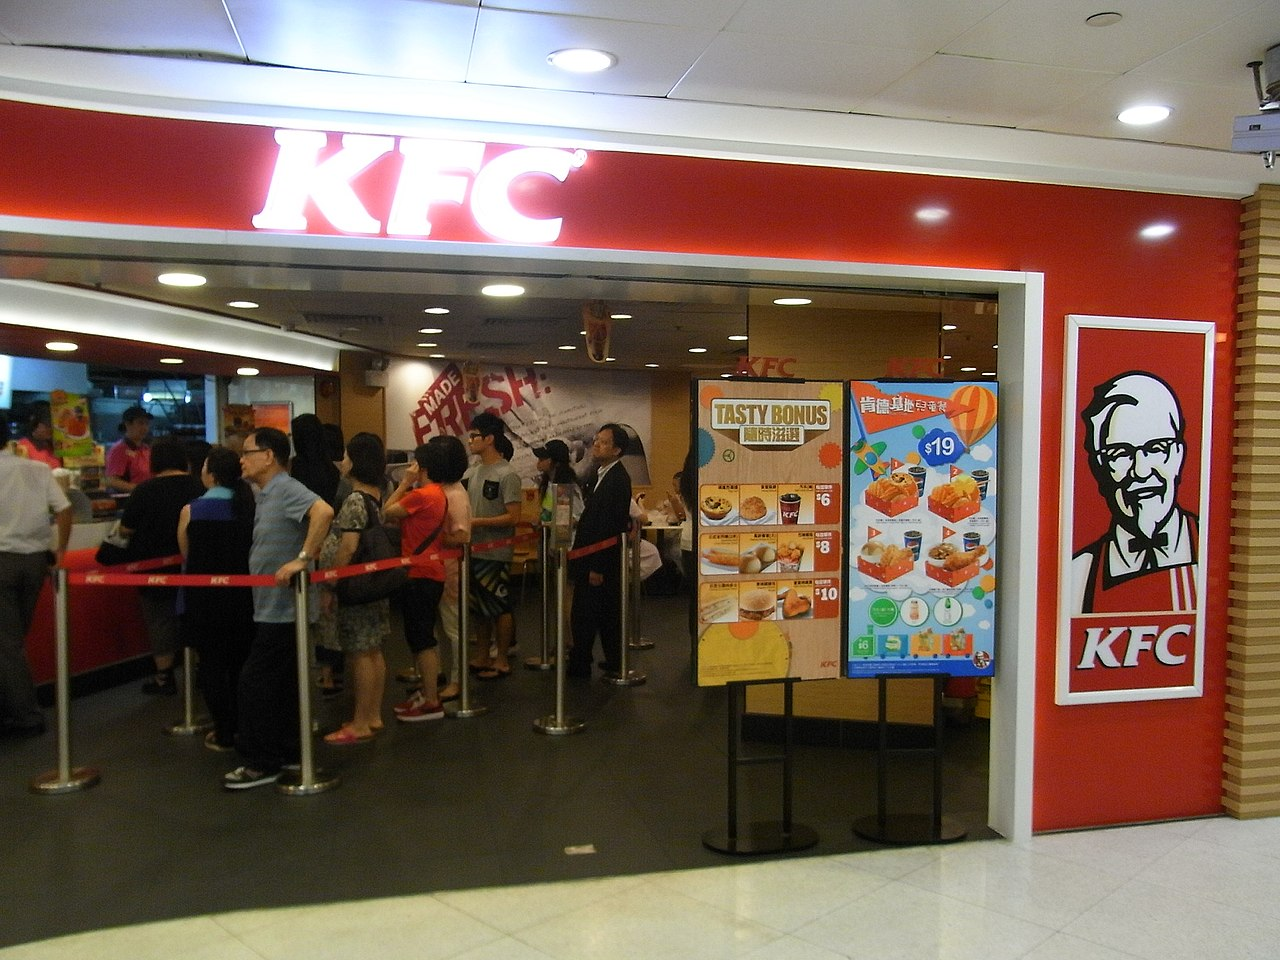 File Hk Chai Wan New Jade Gardens Ping Arcade Restaurant Kfc Sept 2017 Jpg